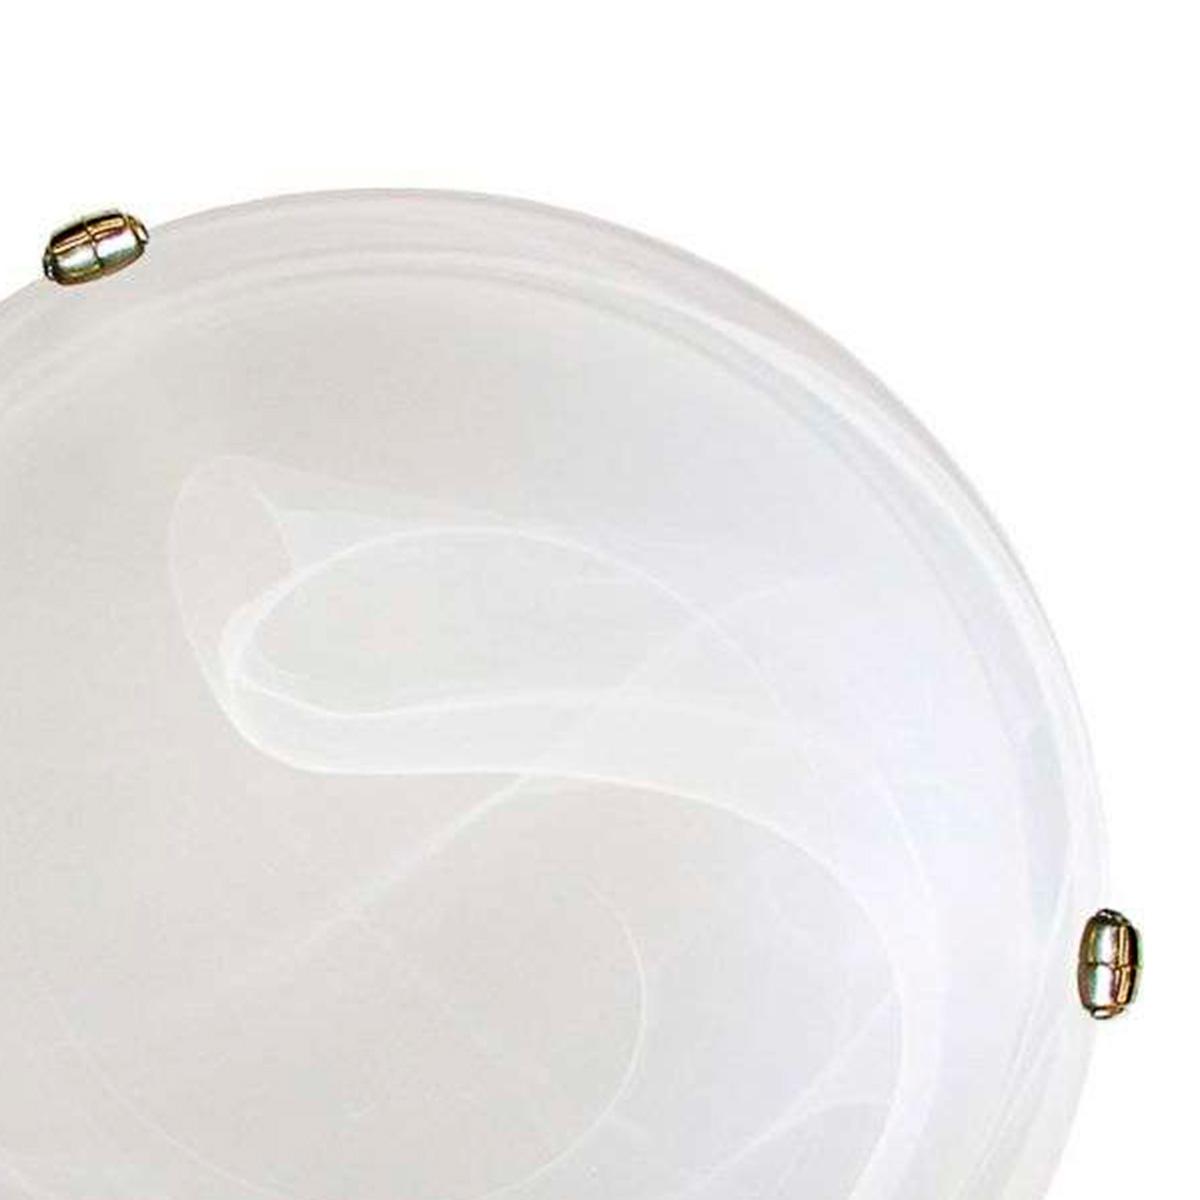 Plafon Murano Vidro 40cm 3 Lampadas E-27 Max 60w Cor Branco Com Garra Dourada